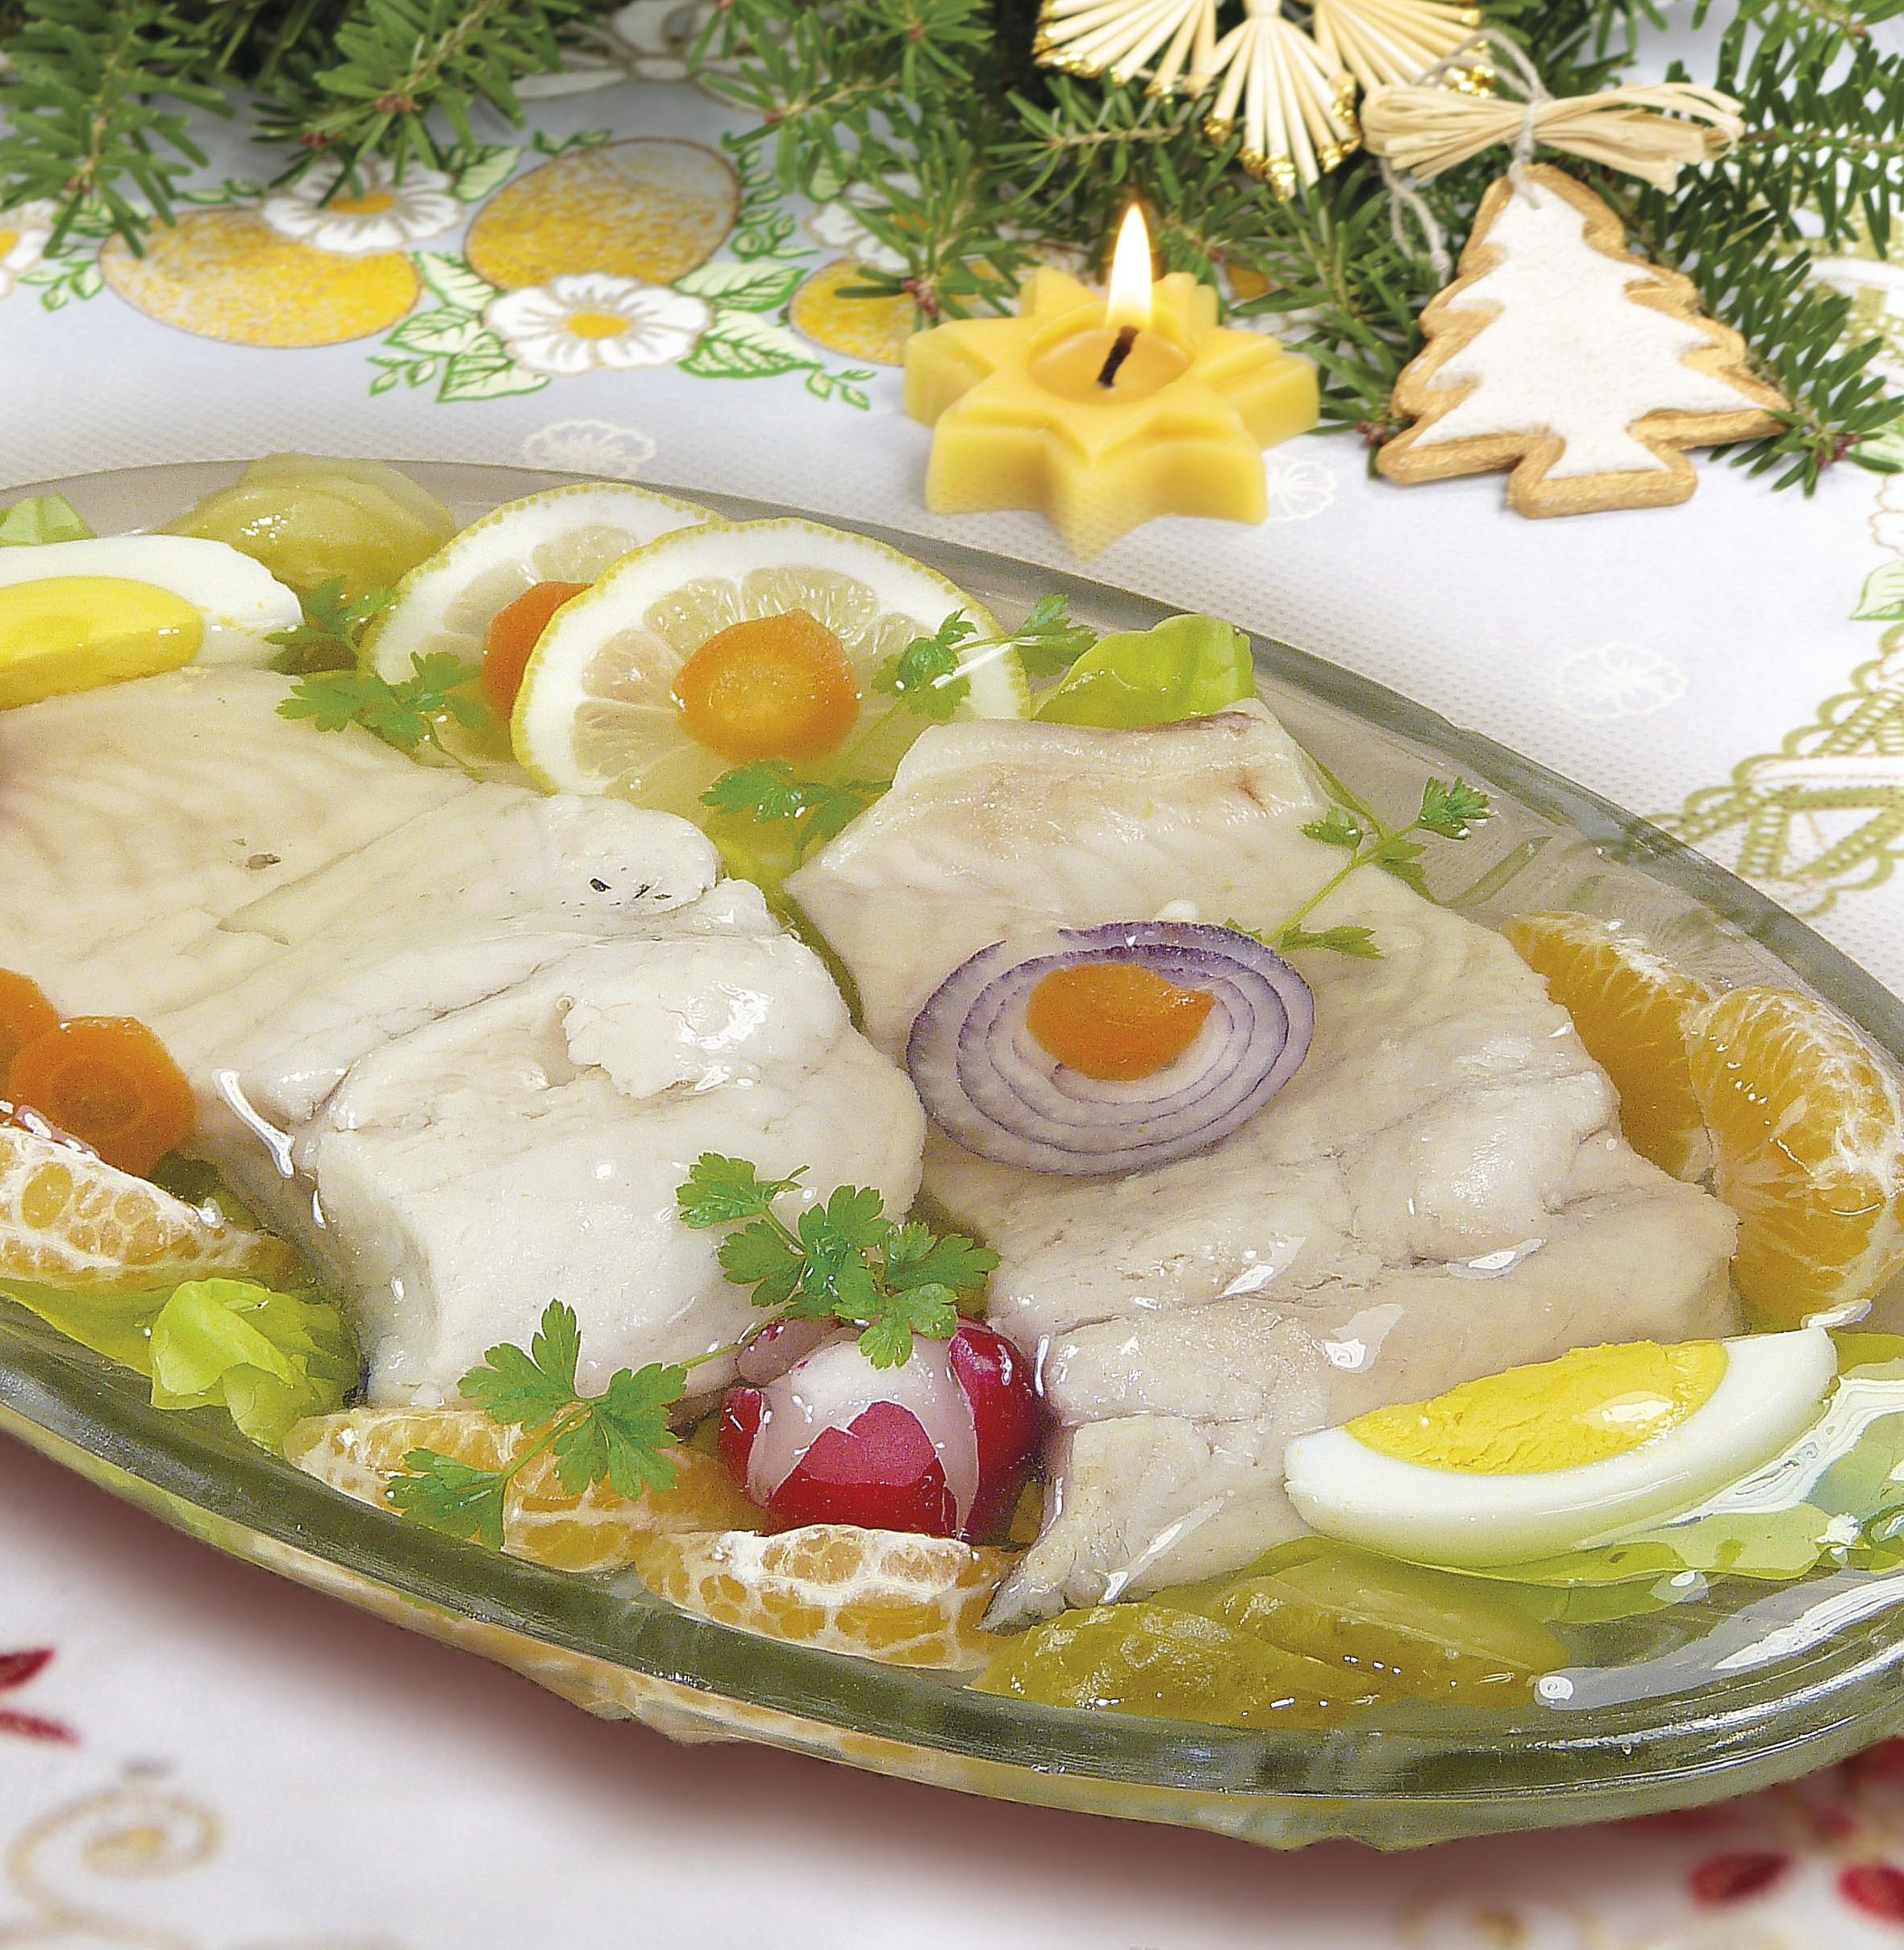 Siostra Anastazja Poleca Seafood Recipes Food And Drink Food